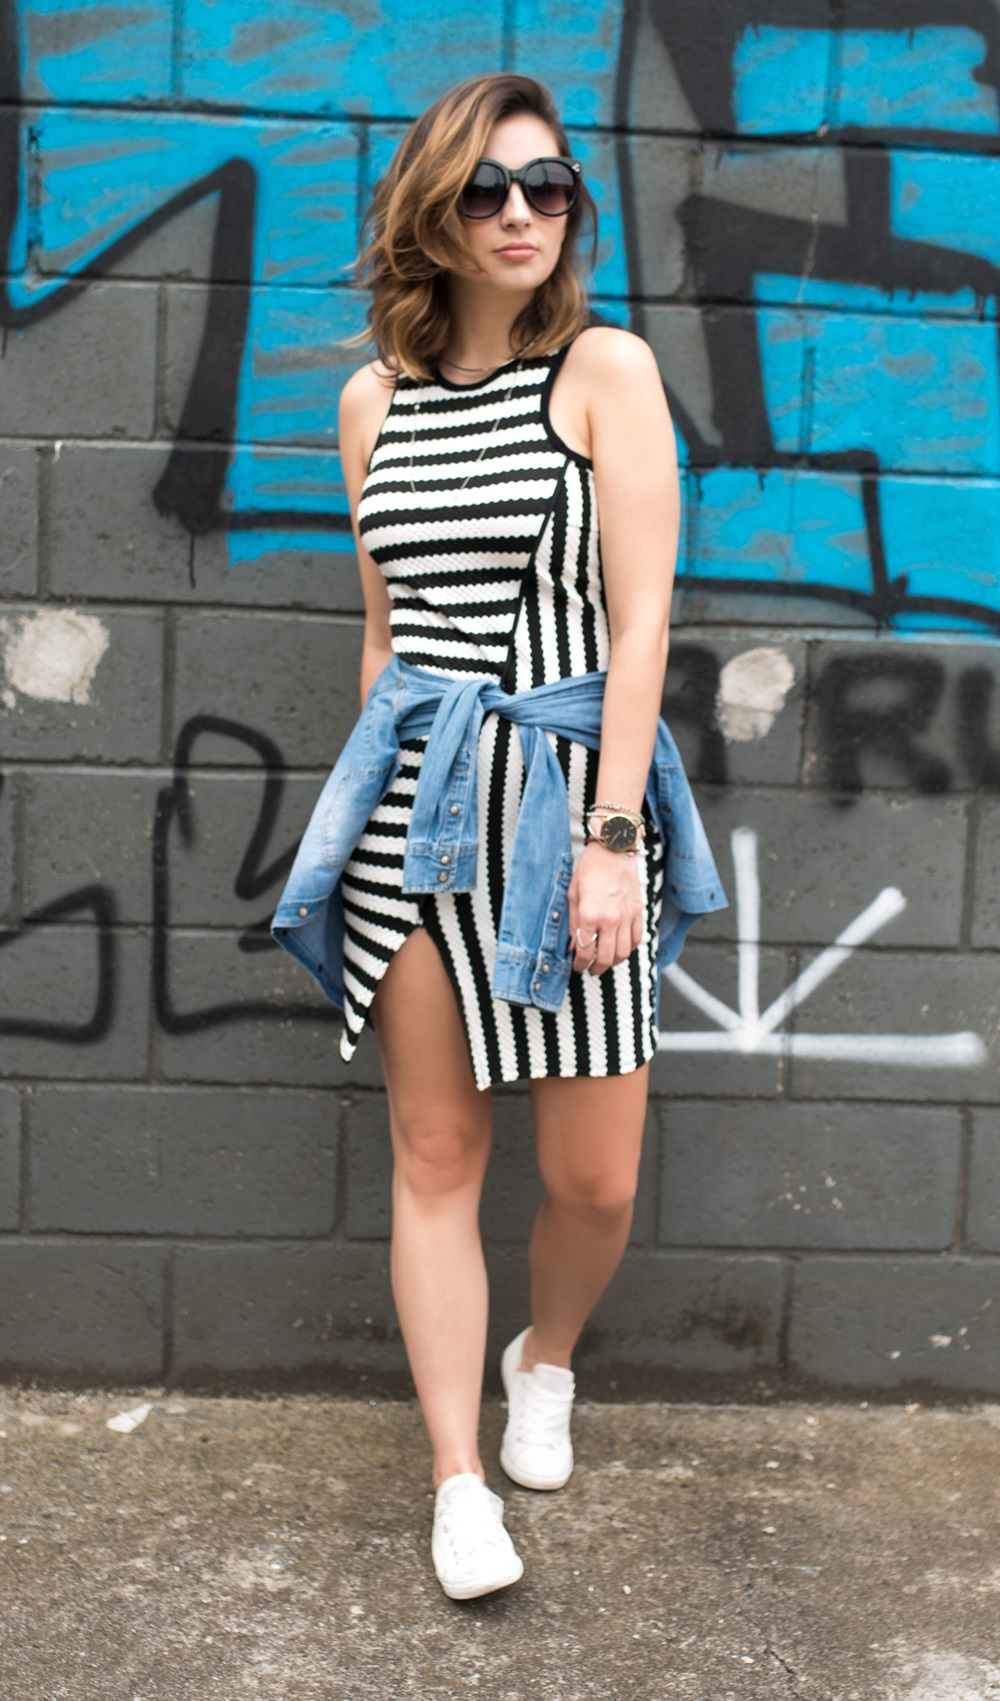 vestido-listrado-camisa-jeans-na-cintura-tenis-branco-look-blog-vanduarte-3